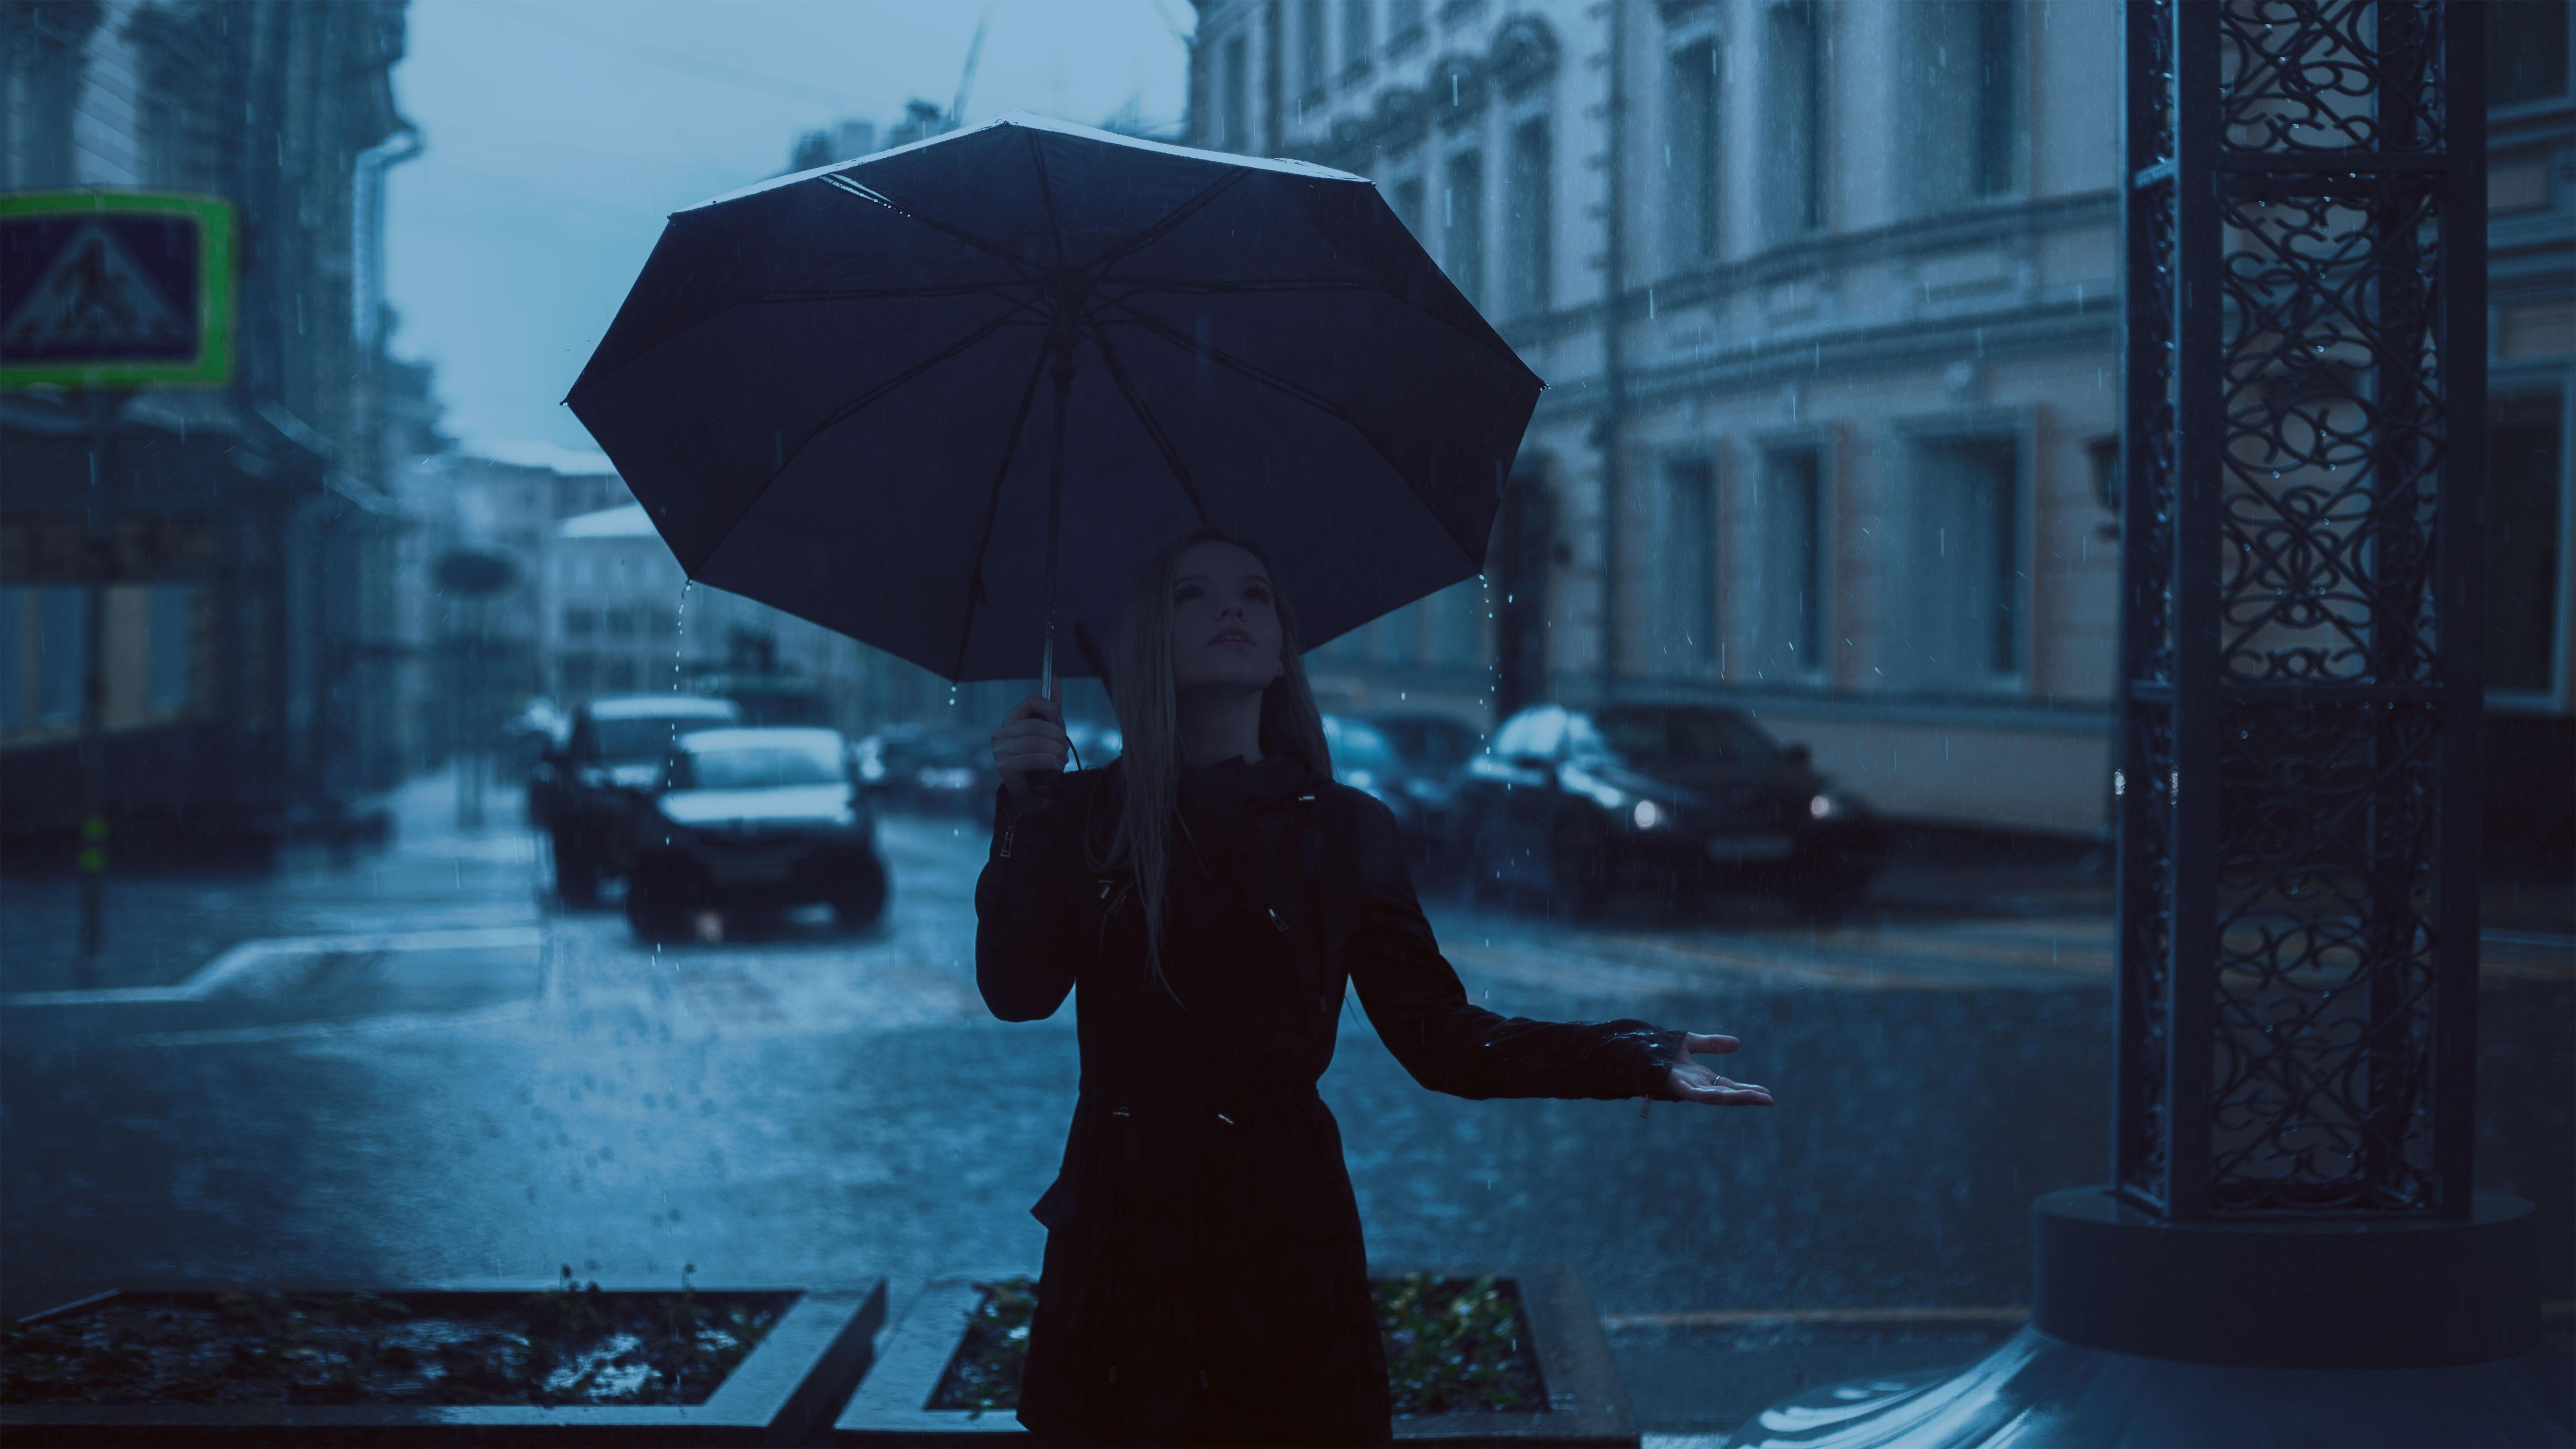 Free Images : Girl, Rain, Cute, Photo, Umbrella, Autumn